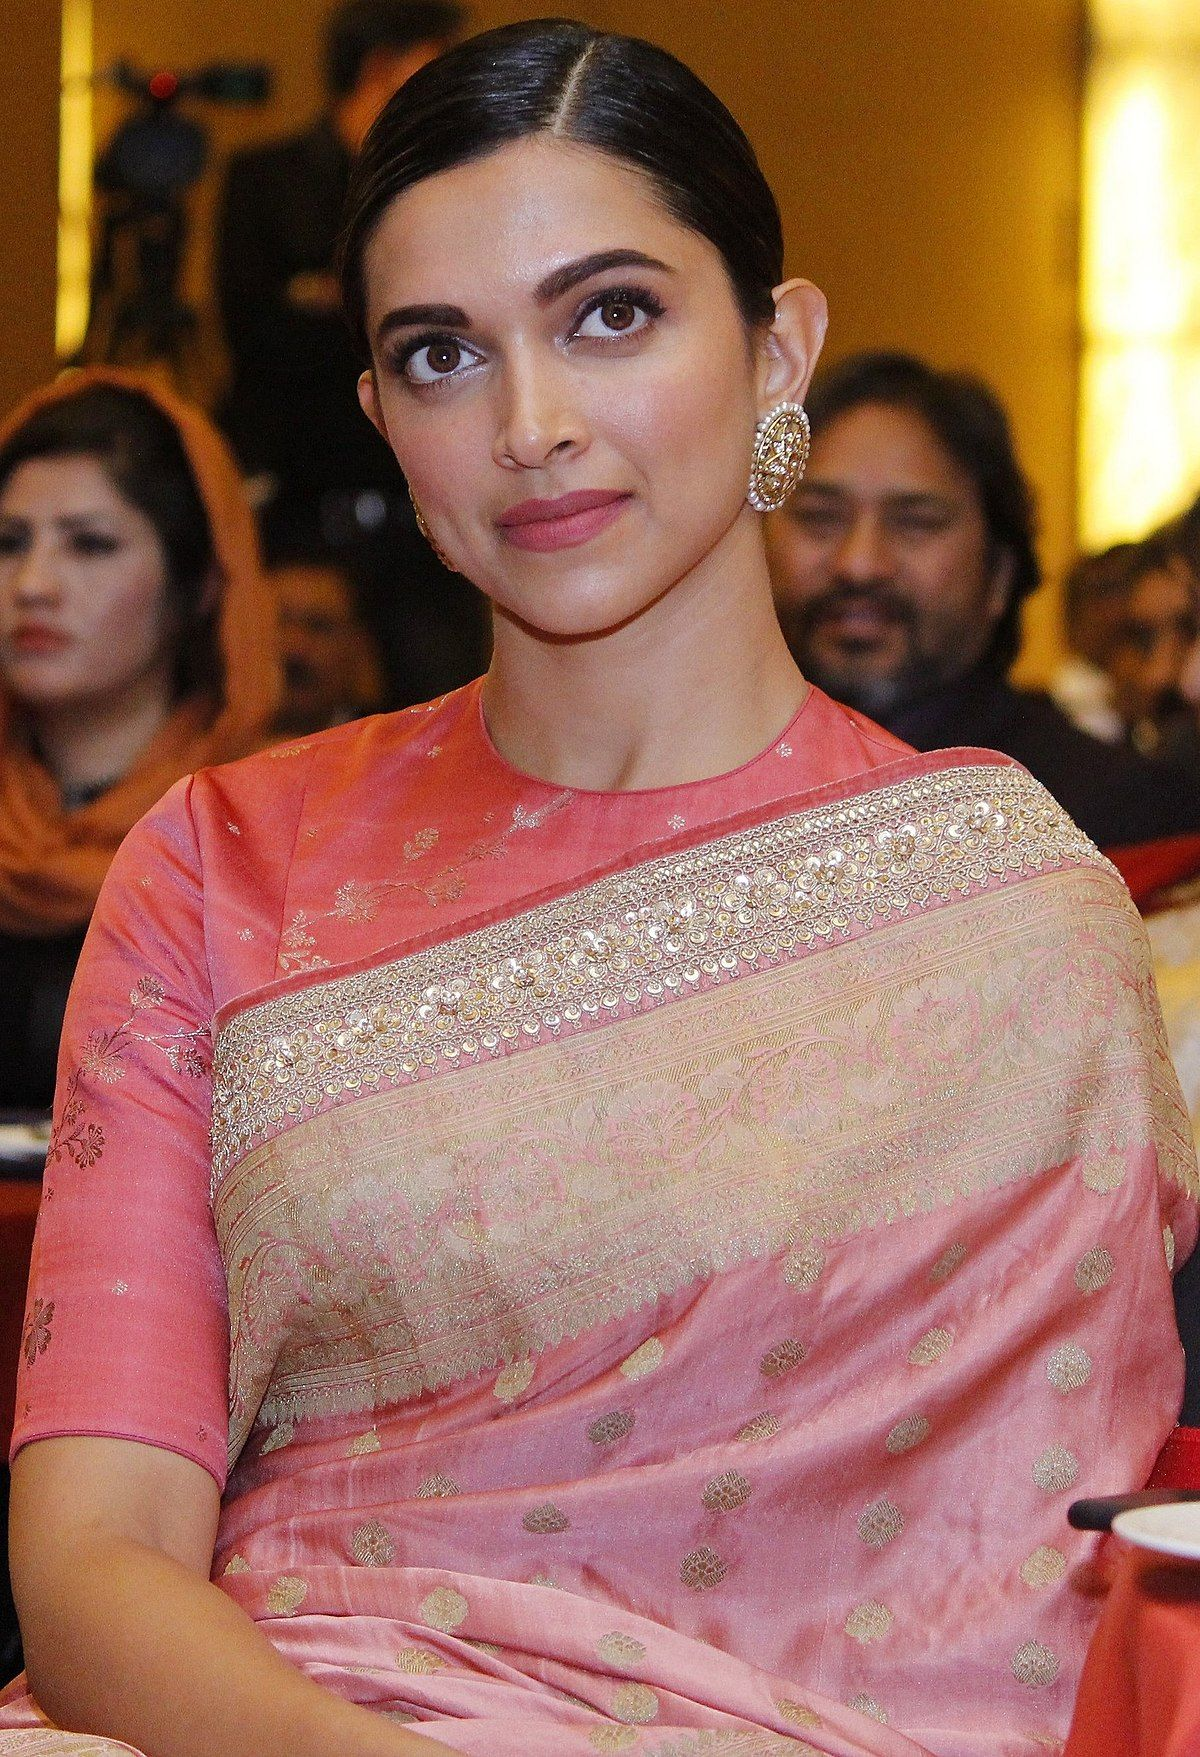 Deepika Padukone - Wikipedia (With images) | Peach saree, Deepika ...